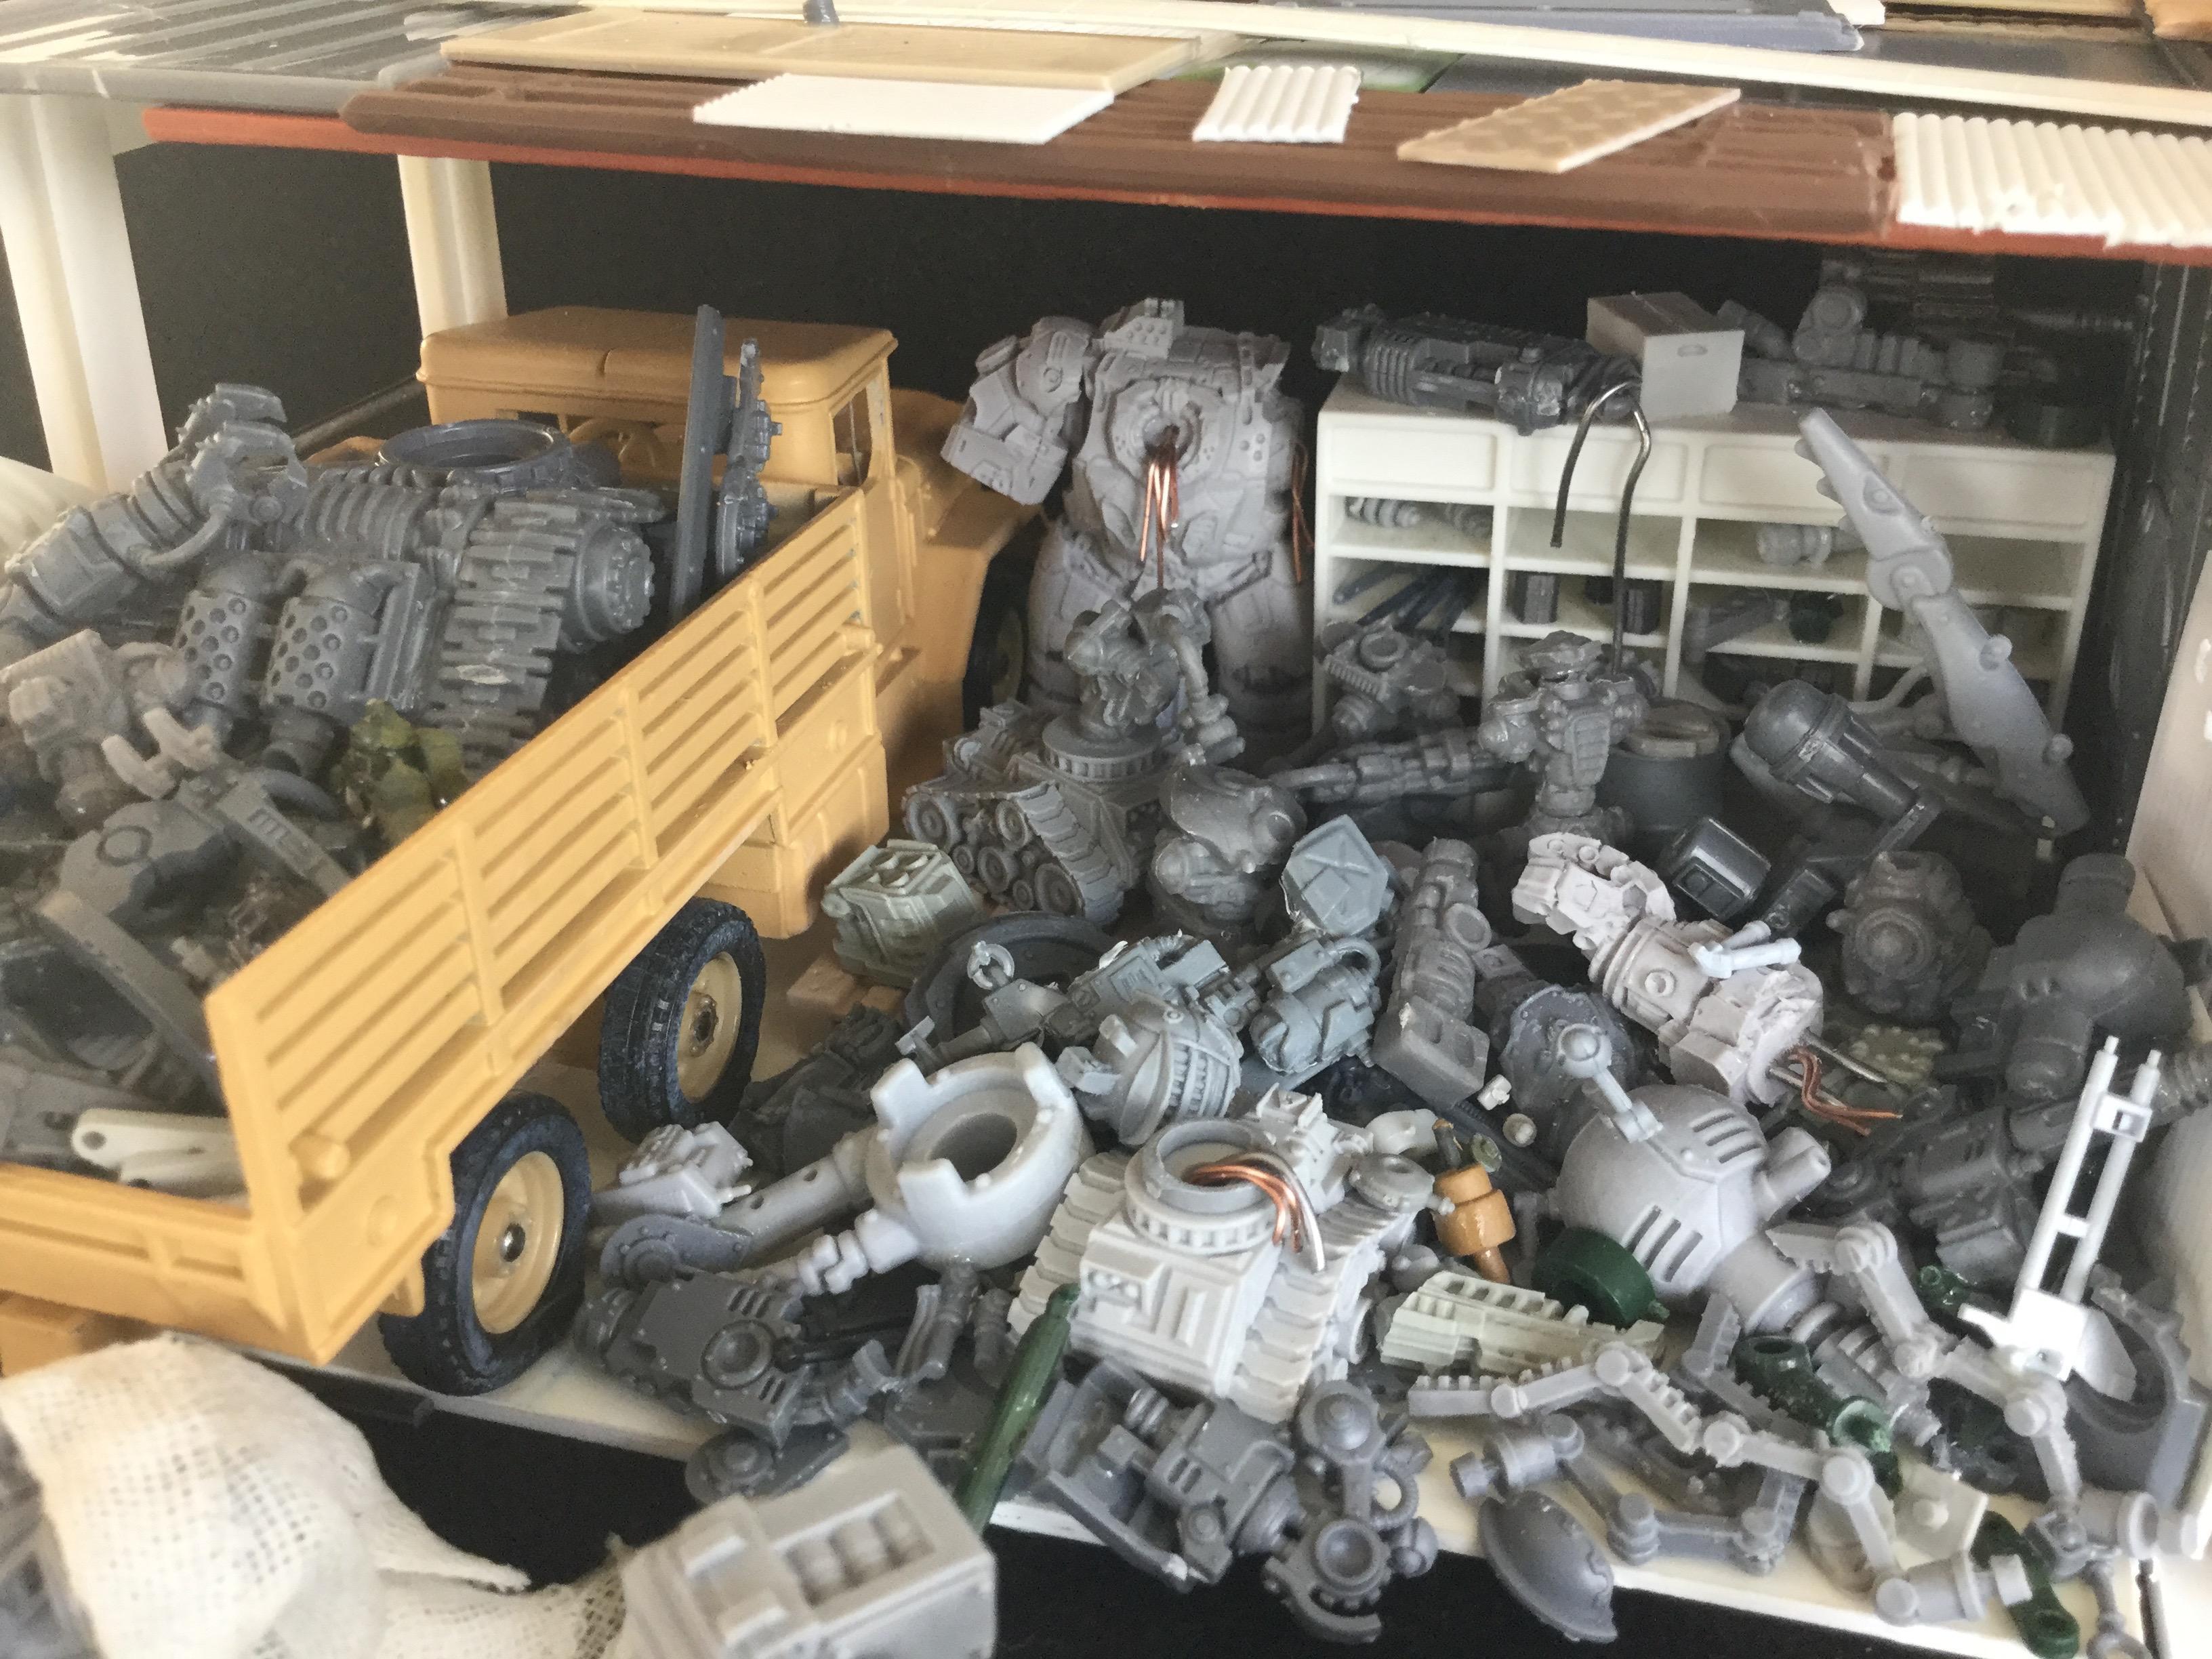 Junk, Shop, Terrain, Truck